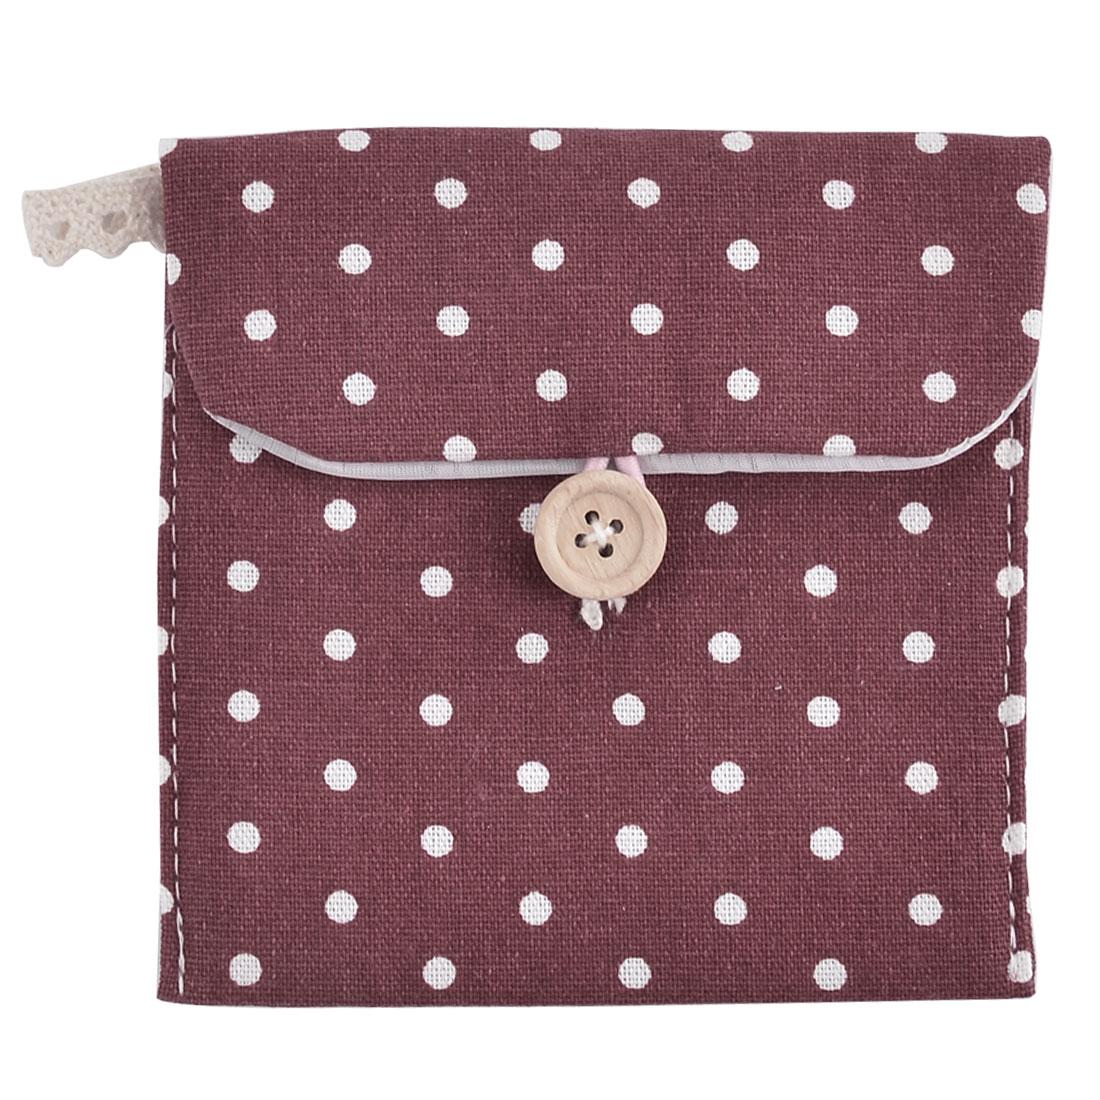 Linen Dots Pattern Button Closure Design Sanitary Towel Pad Bag Burgundy 2 Pcs